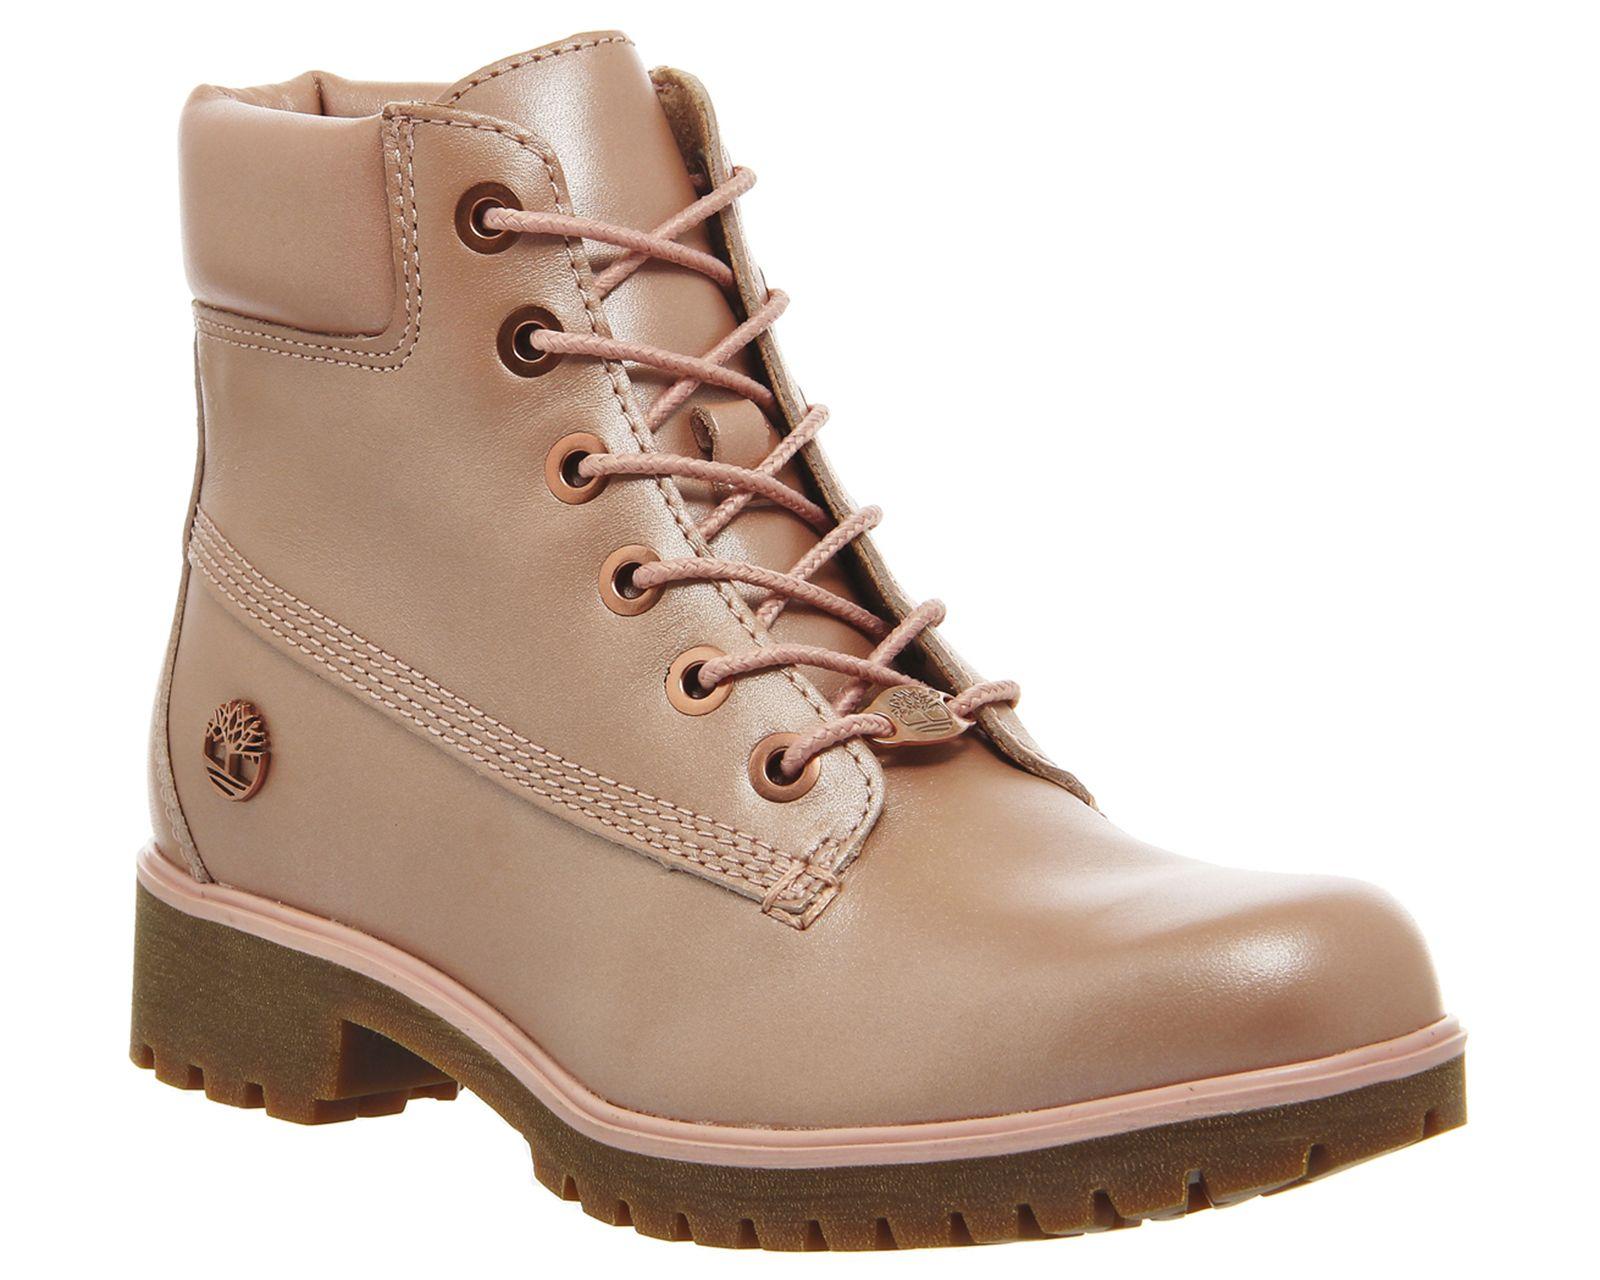 Timberland Slim Premium 6 Inch Boots Sherbert Pink Leather